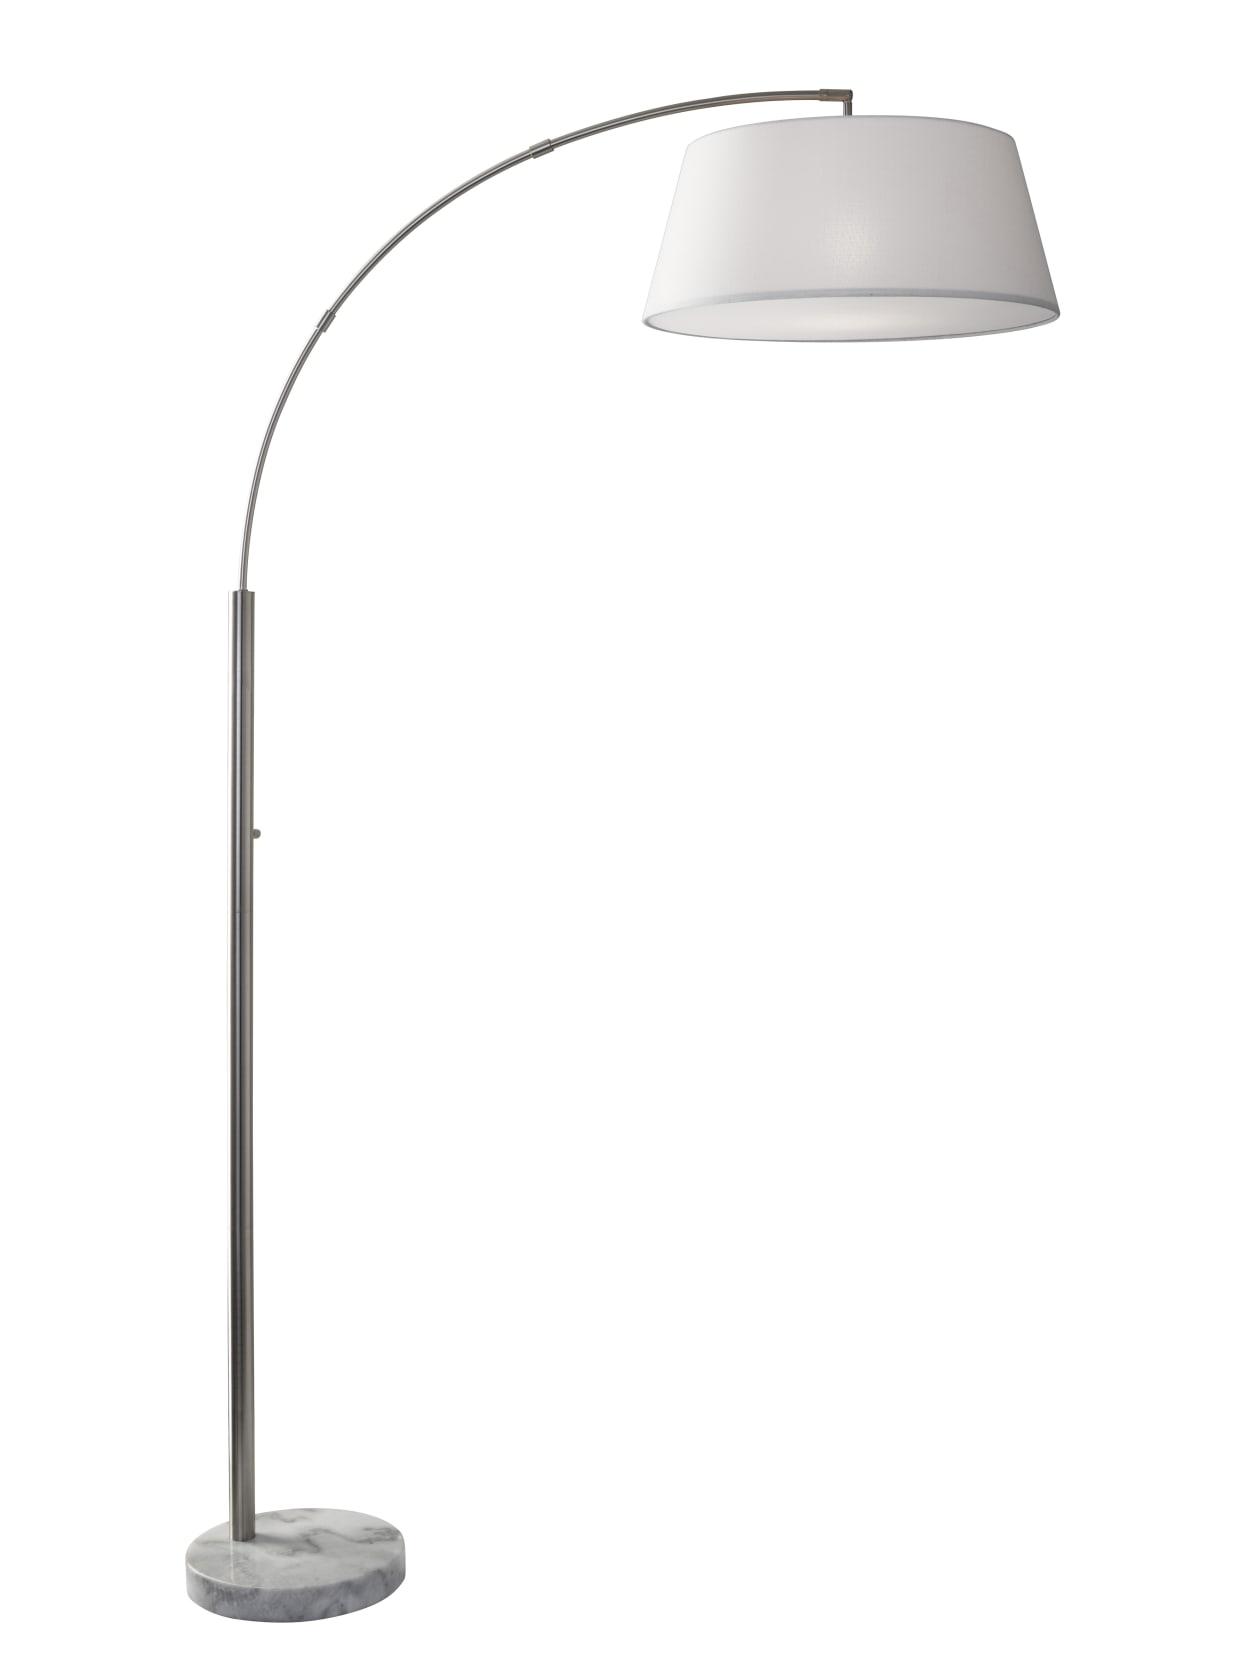 Adesso Thompson Arc Floor Lamp 82 H White Shadebrushed Steelwhite Base Office Depot